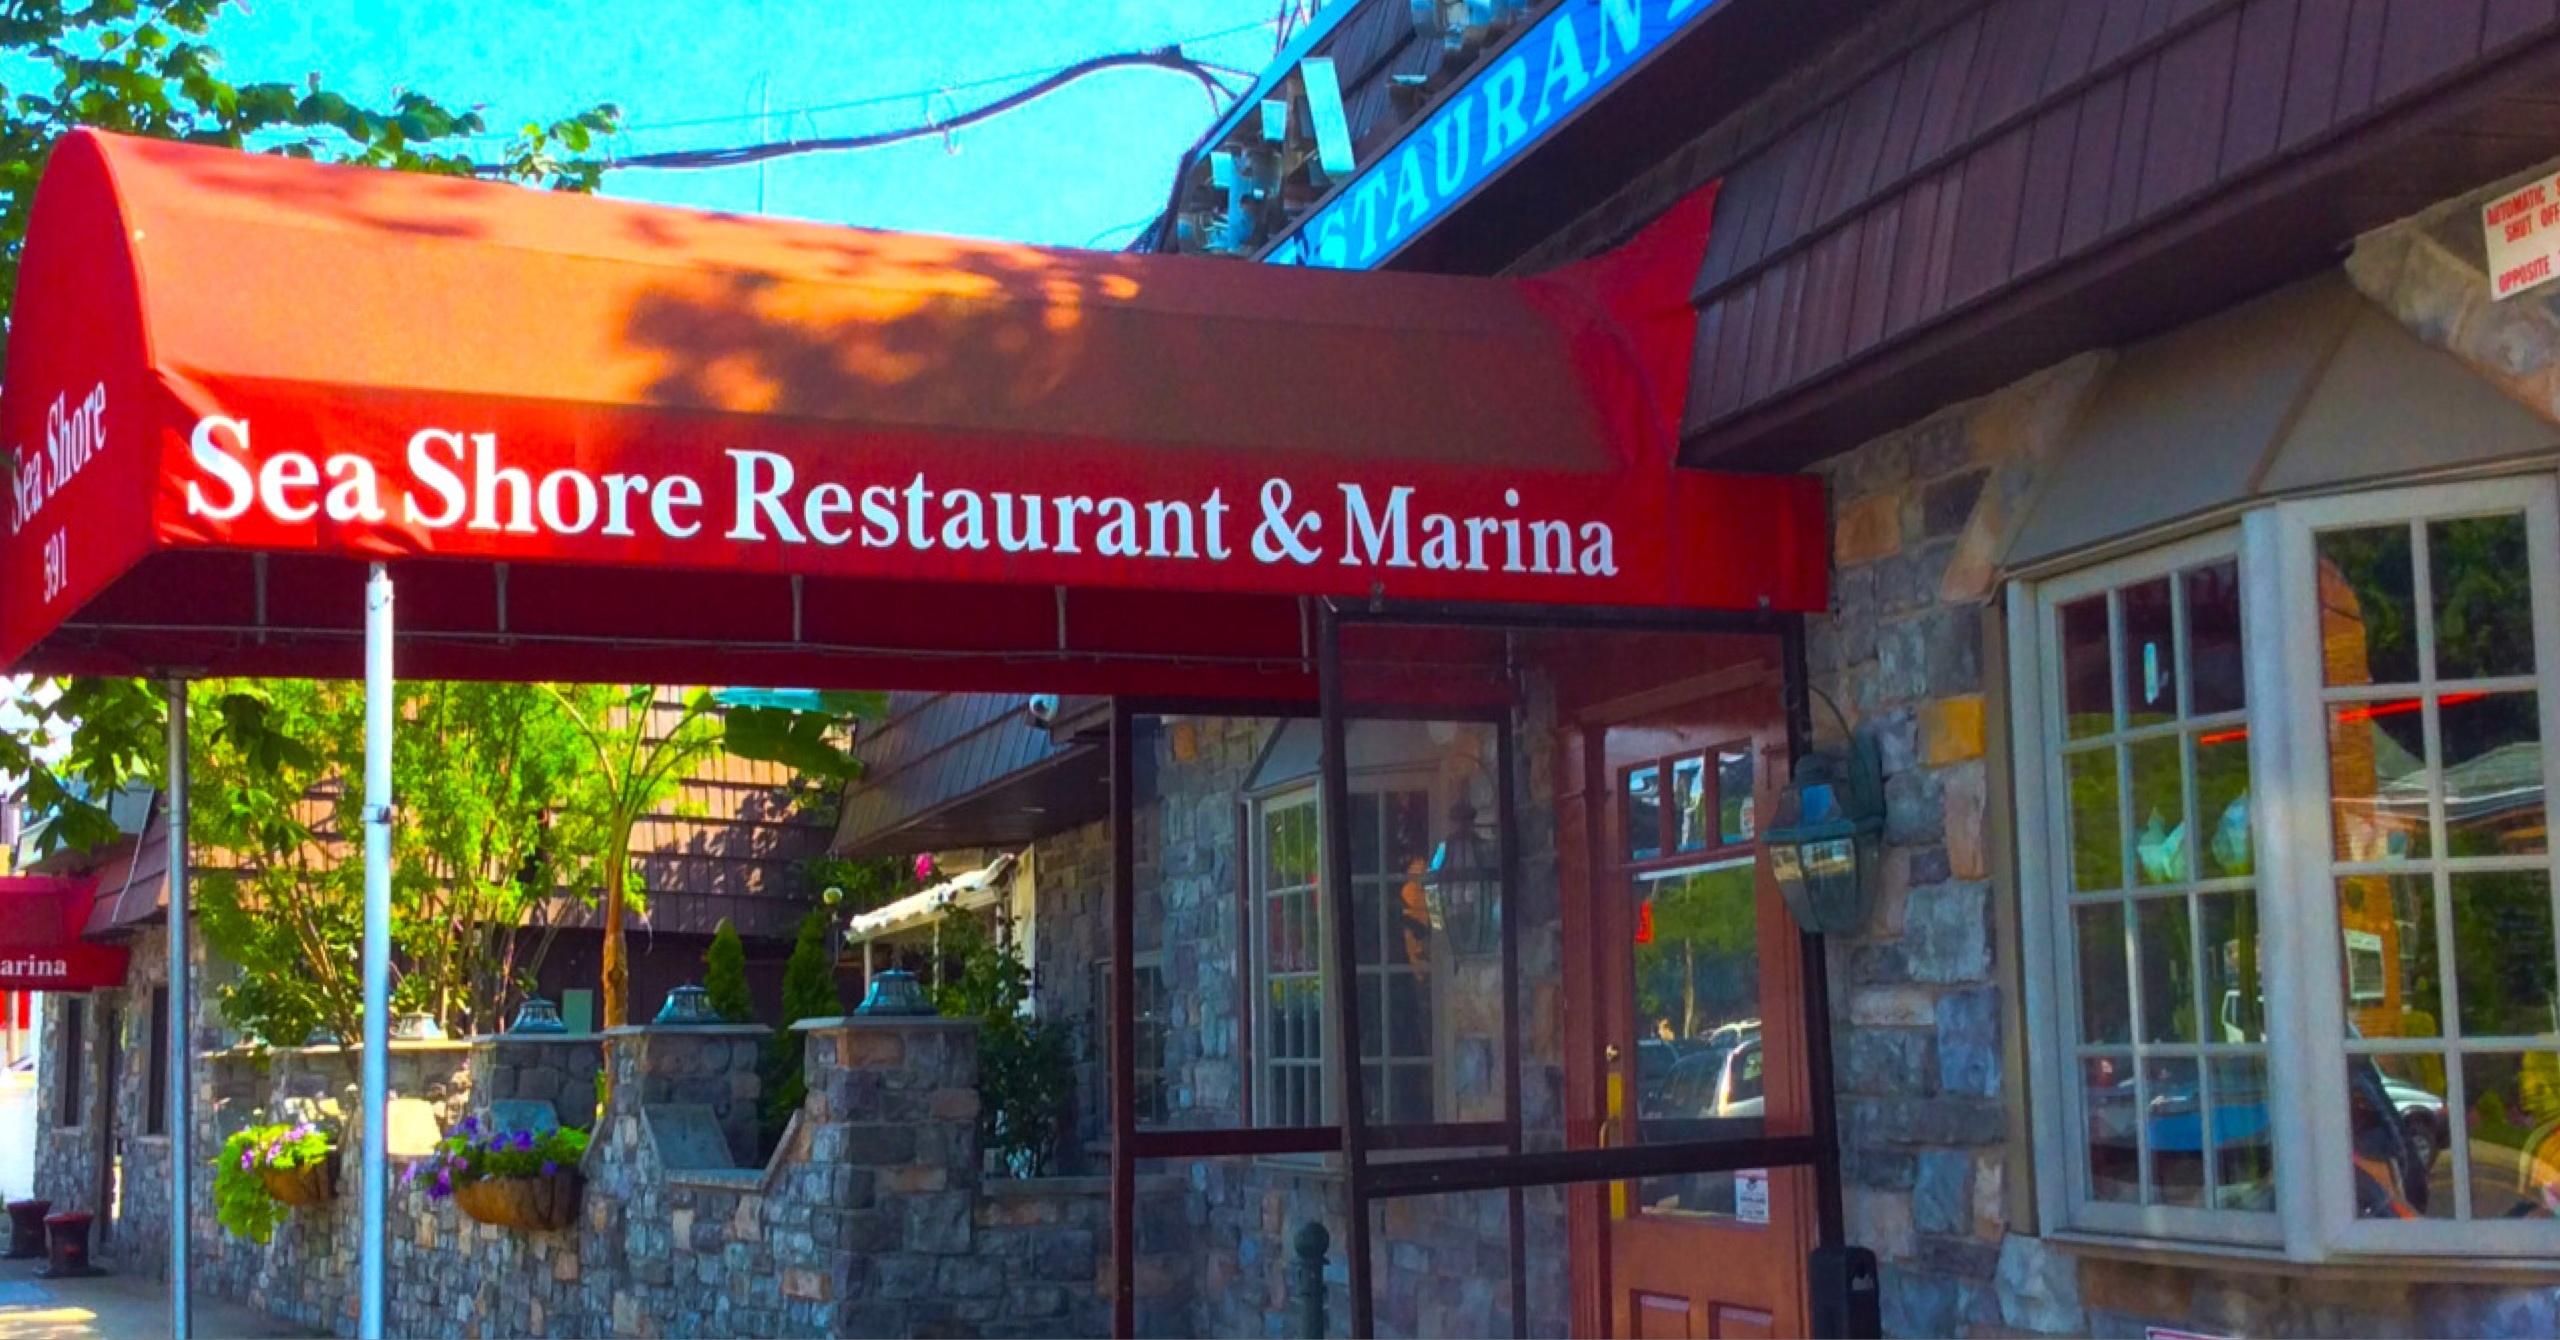 Sea shore restaurant city island dandy in the bronx